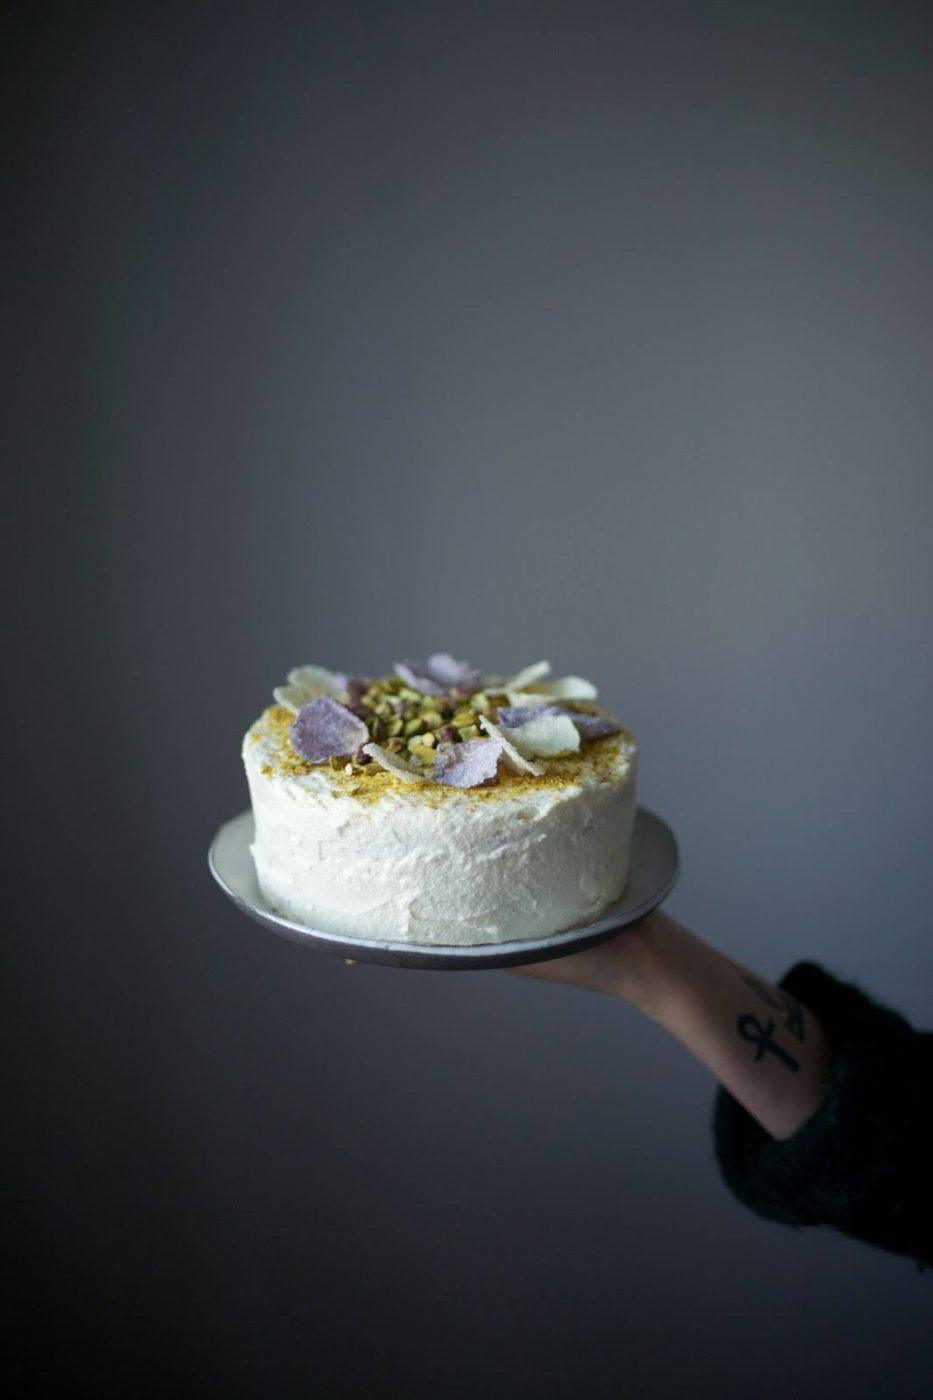 Image for Gluten-free Pistachio Rose Cake